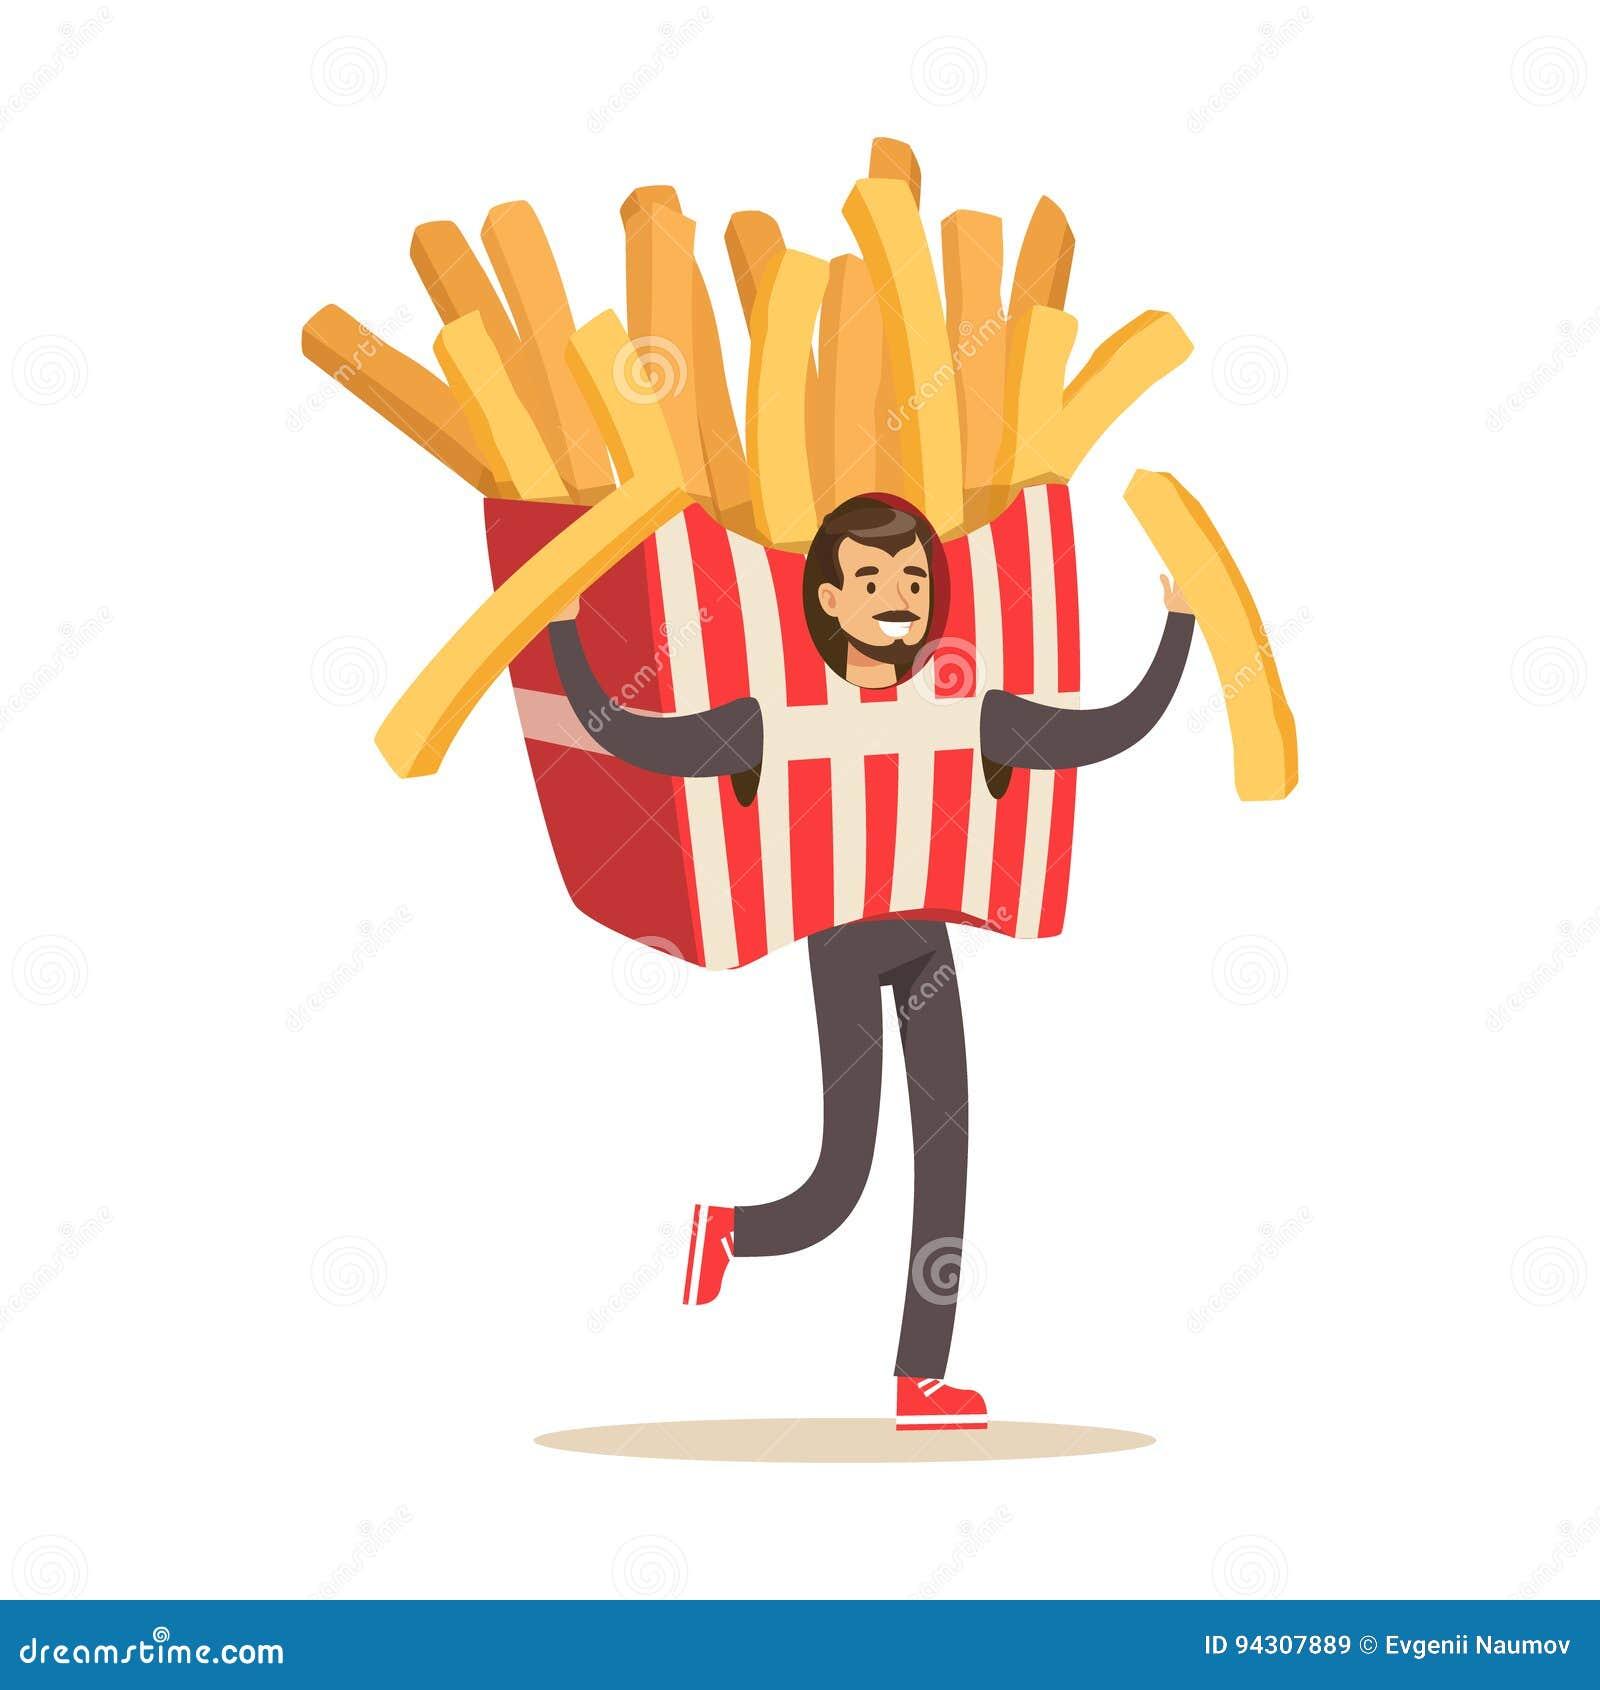 Fast Food and Food Handler Wear